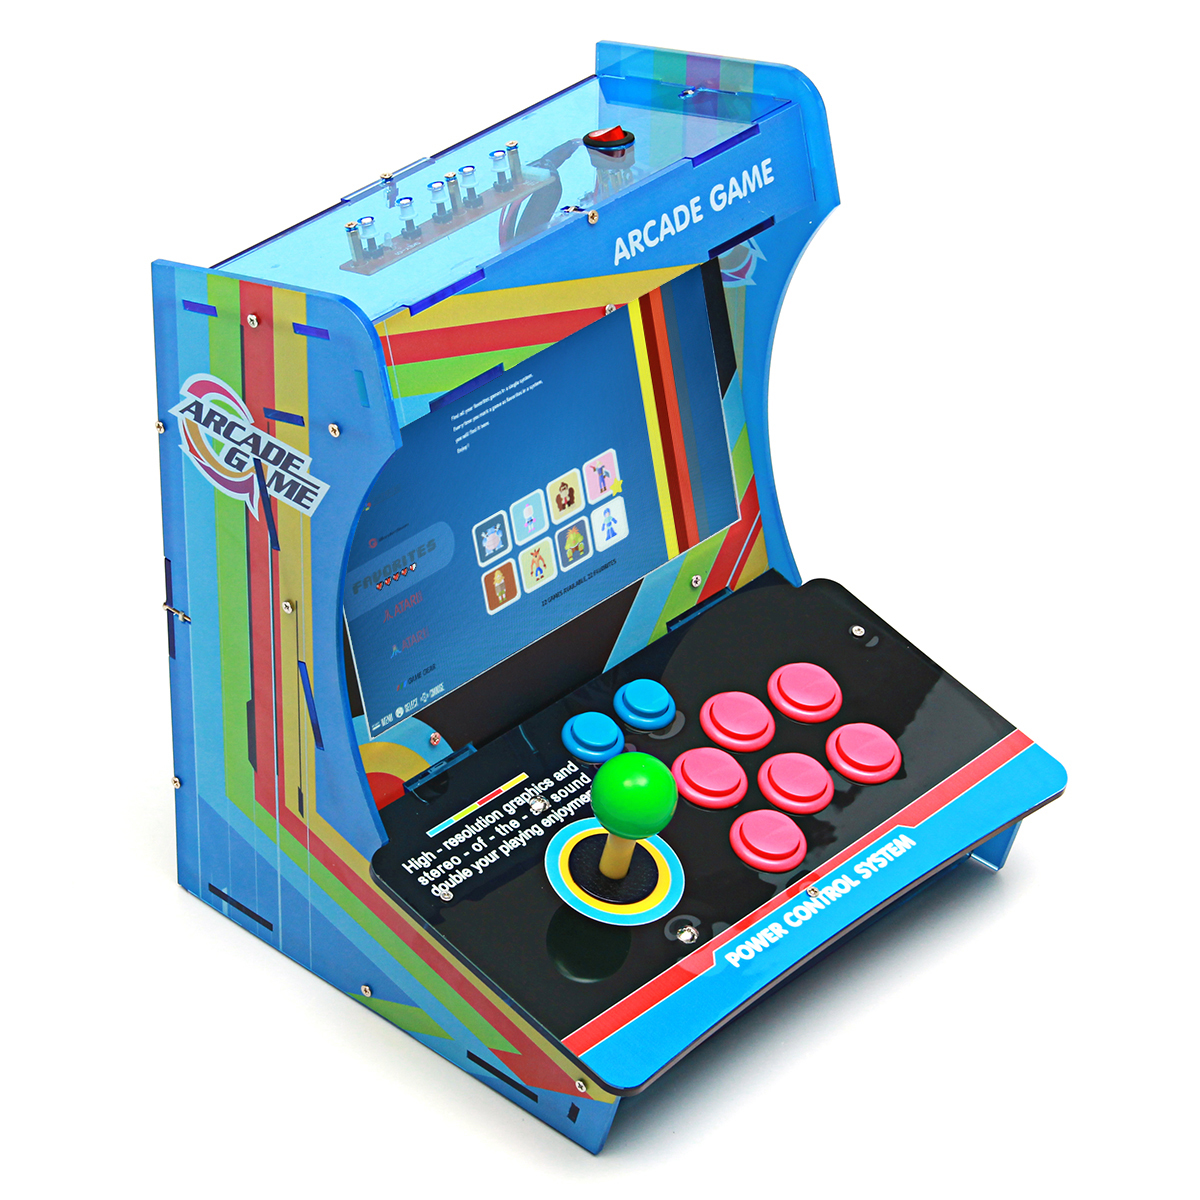 Raspberry Pi 3 Model B 32G Retro Video Arcade Game Console